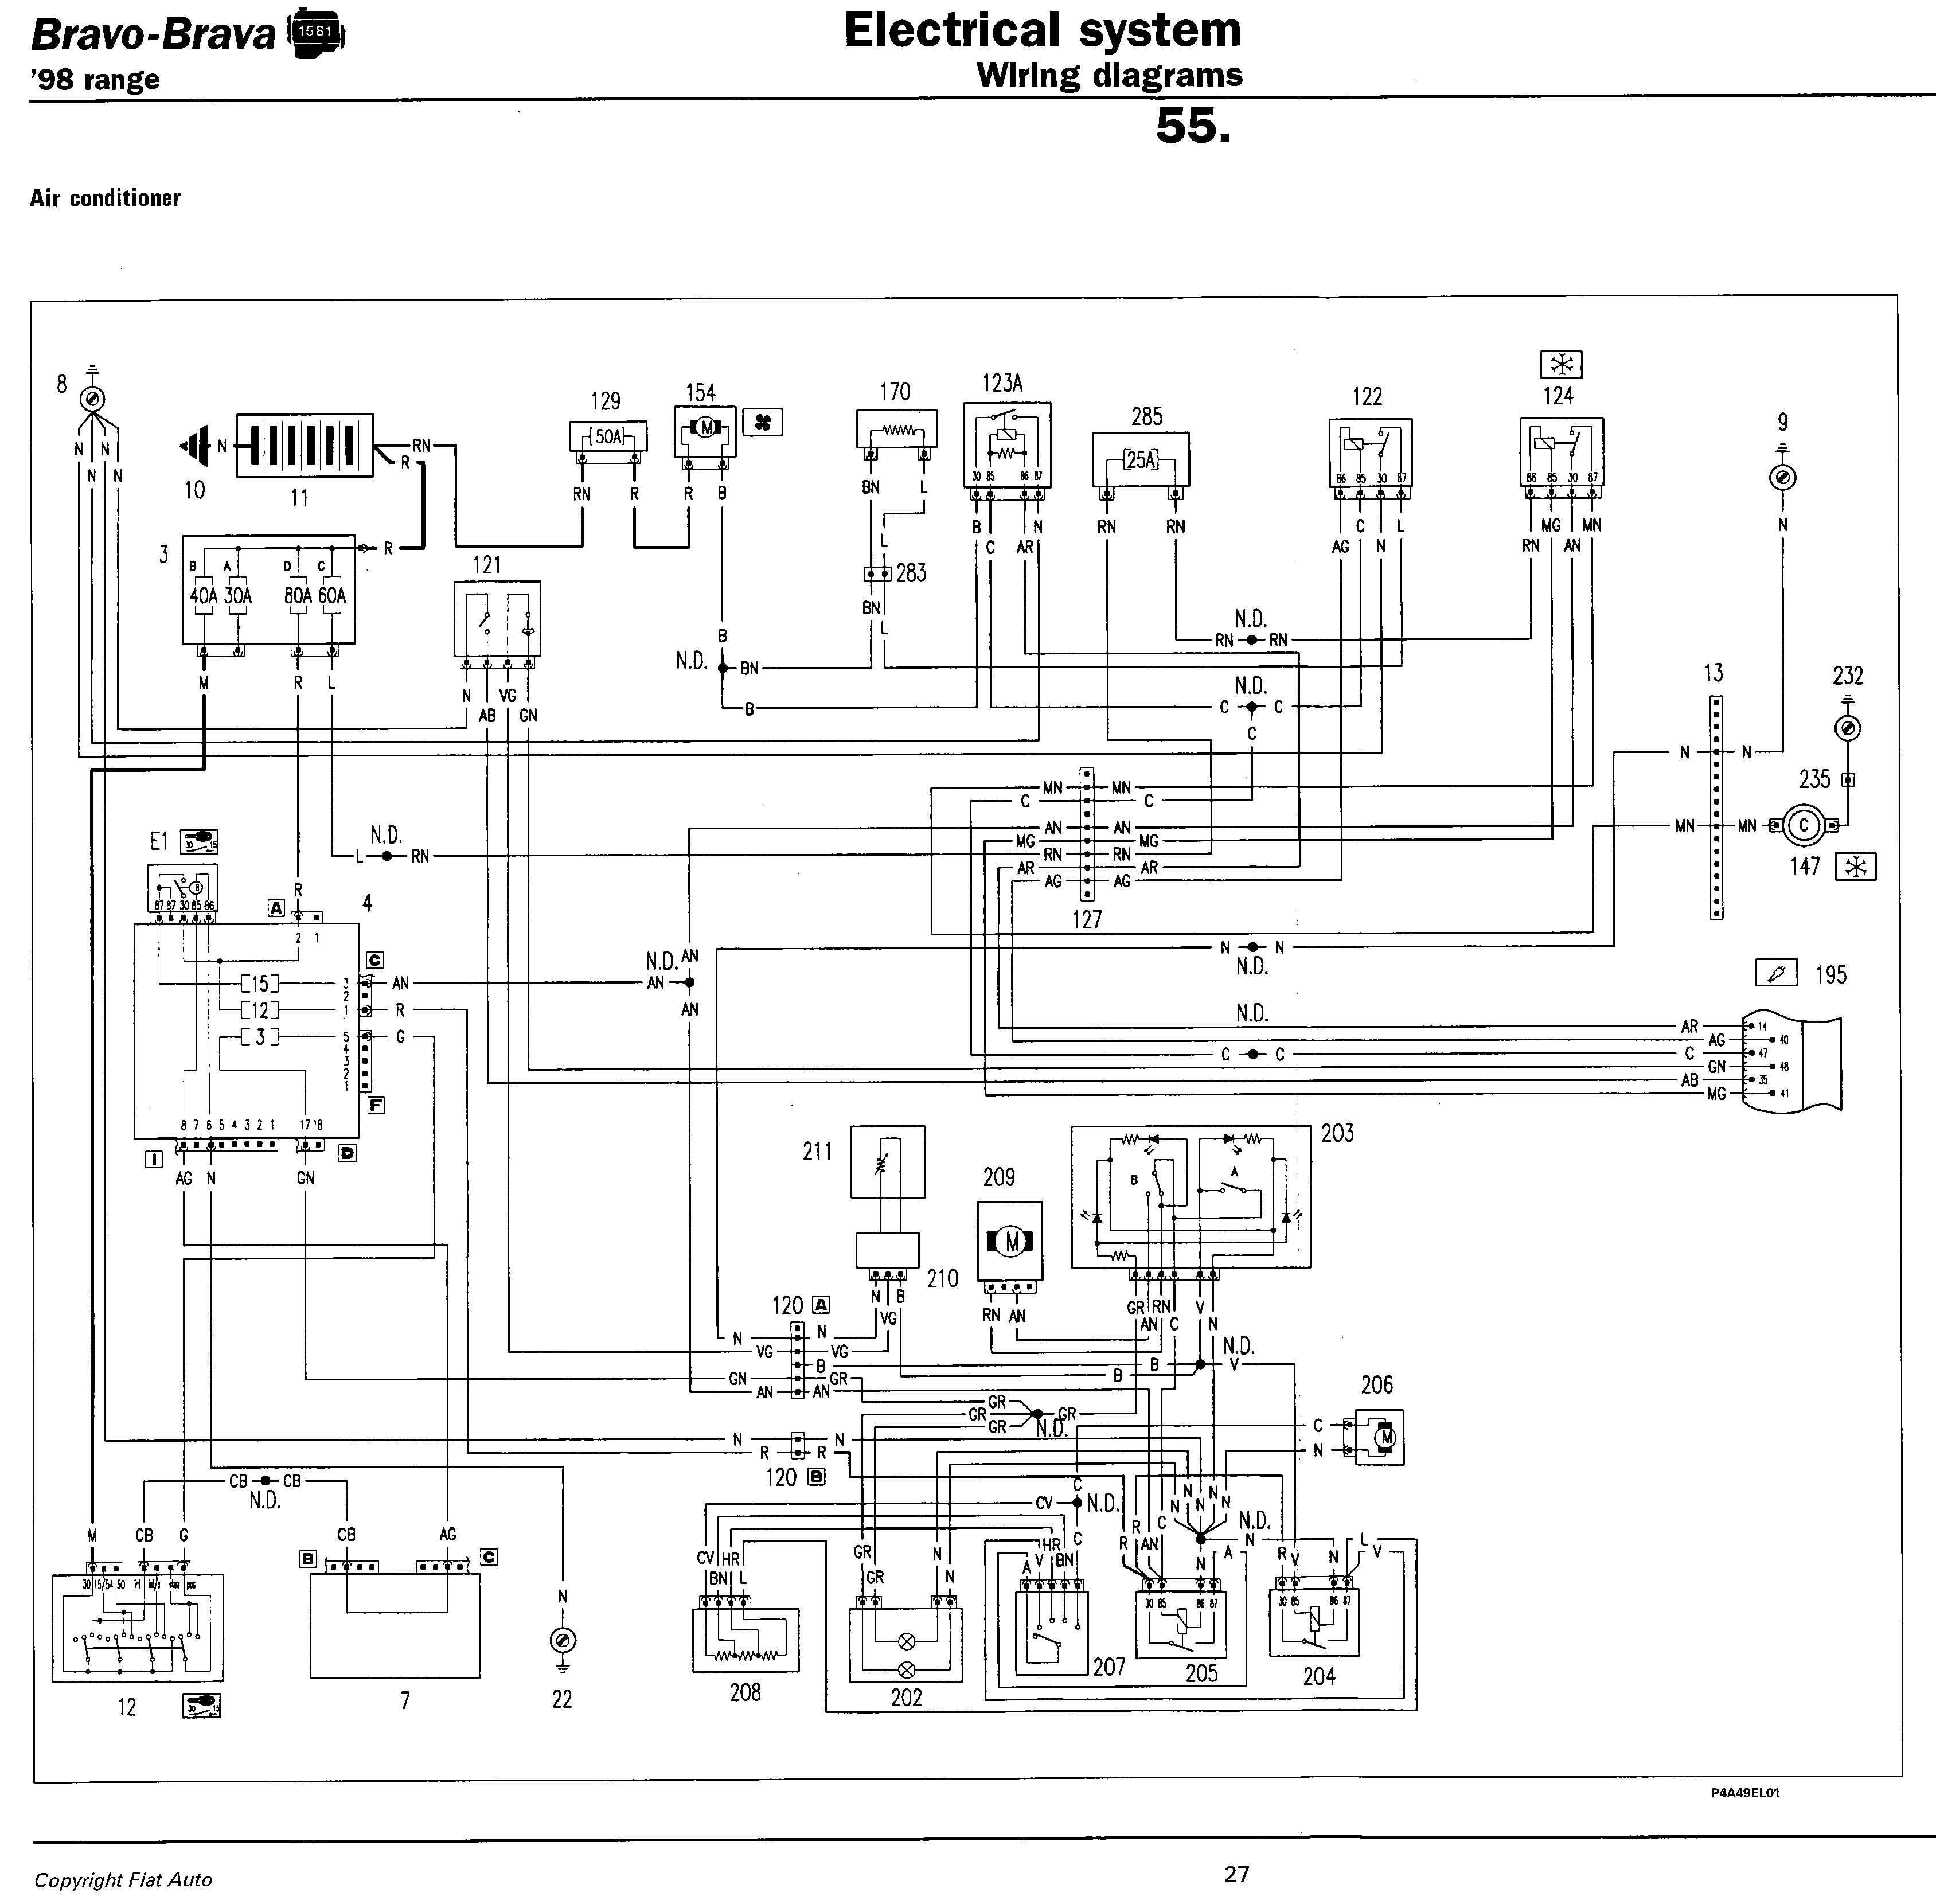 Diagram Haynes Fiat Punto Wiring Diagram Full Version Hd Quality Wiring Diagram Anawiringx18 Locandadossello It